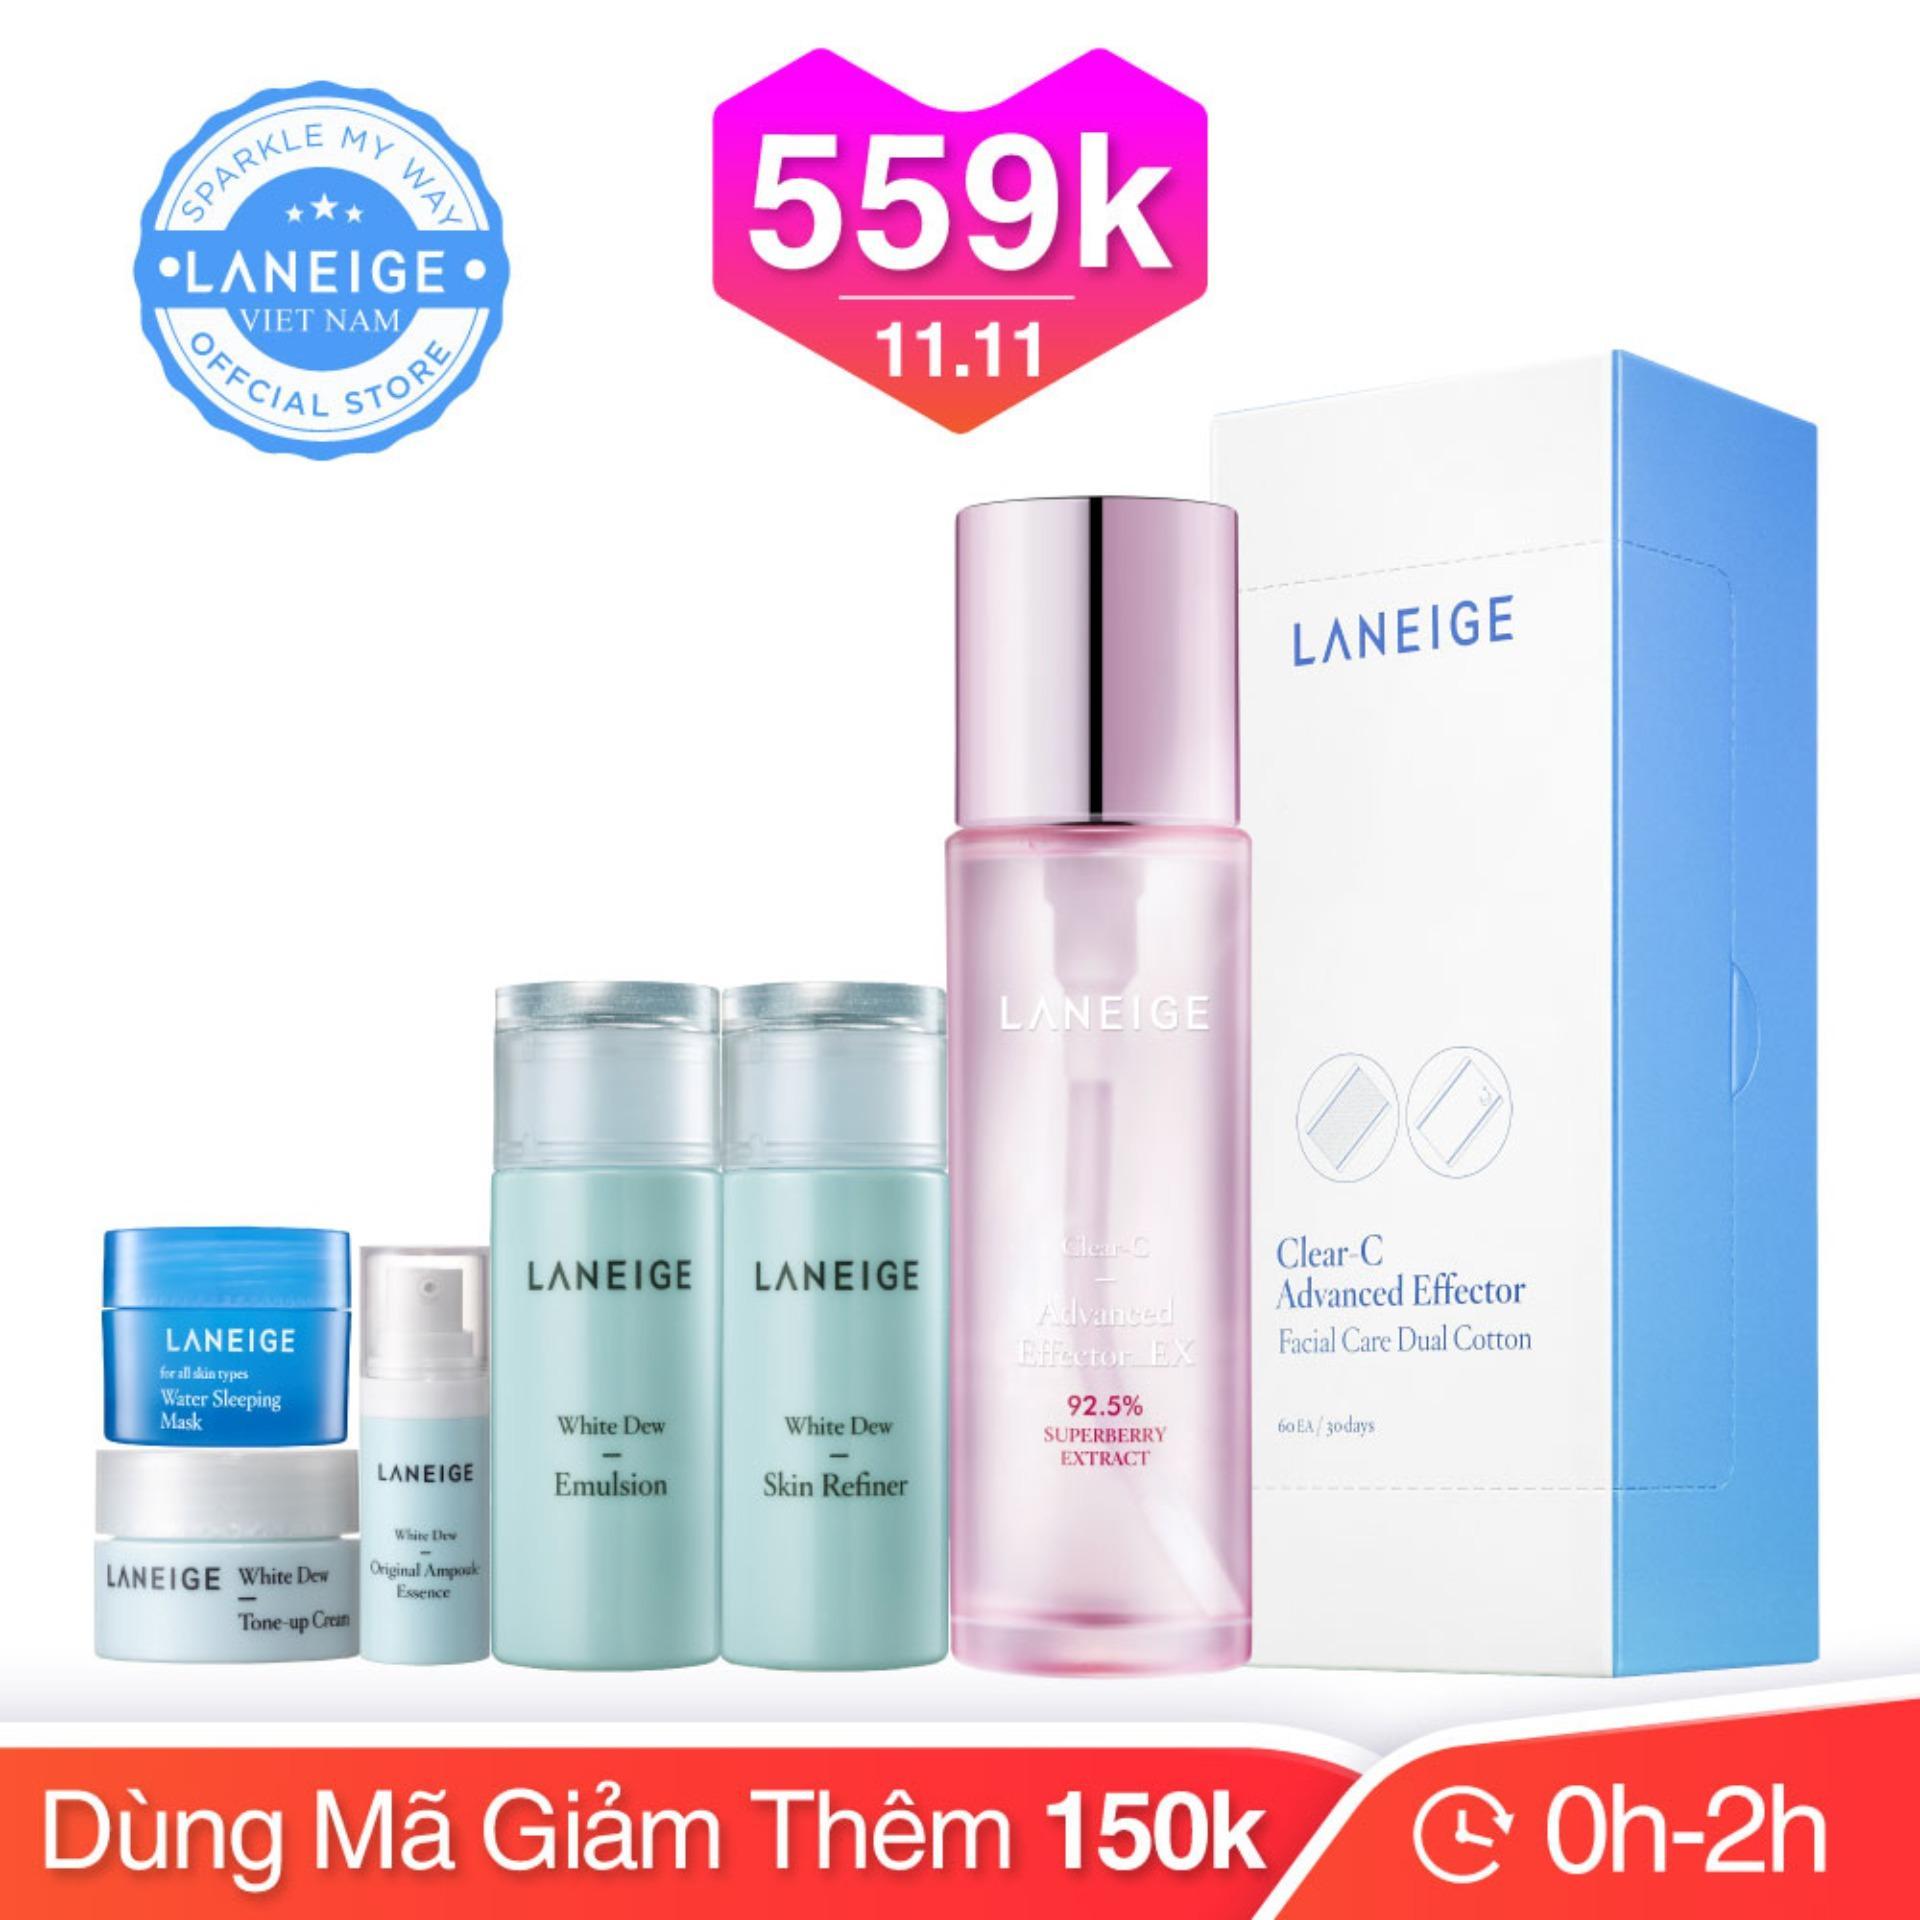 Bộ dưỡng da trắng hồng rạng rỡ Laneige Clear C Advanced Effector Ex 150ml